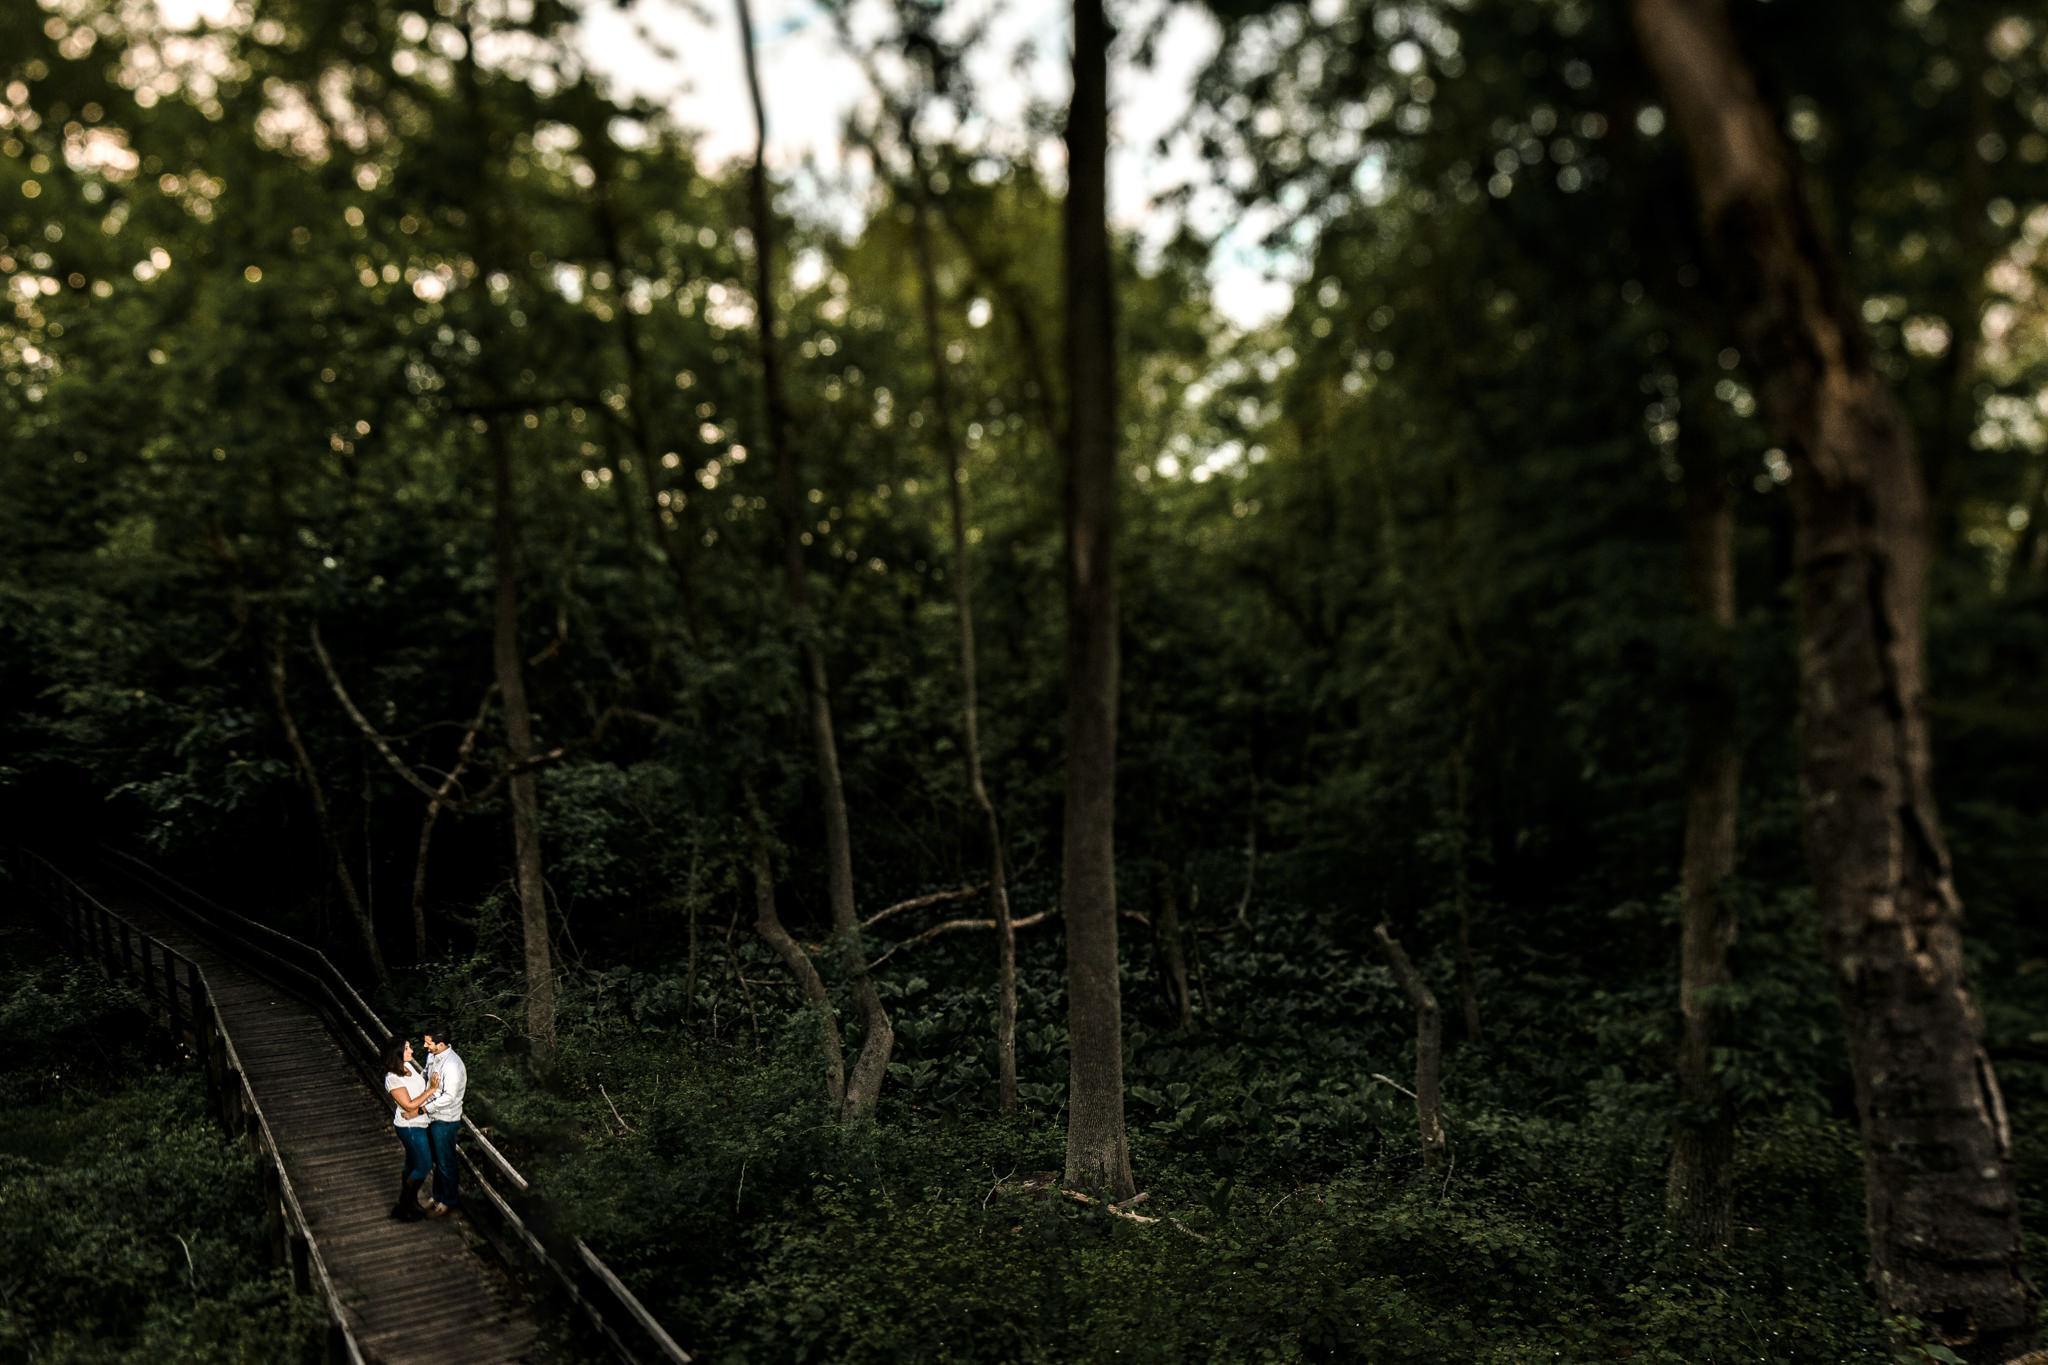 Gilbert-Allaire-State-Park-NJ-Engagement-Photos-03.JPG